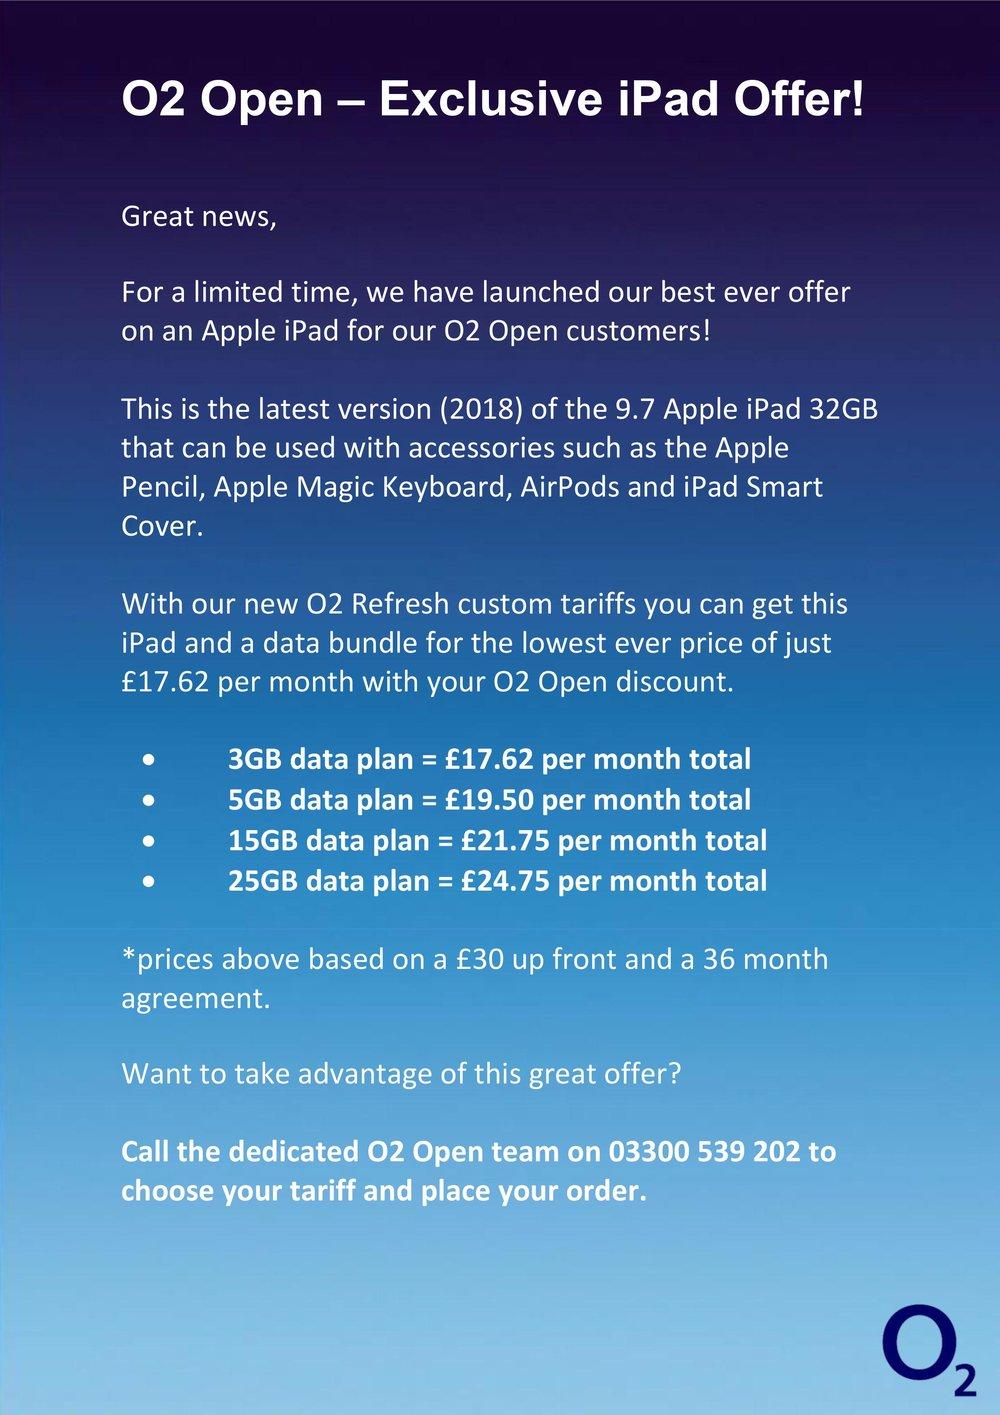 O2 Open iPad Offer Oct 2018.jpg